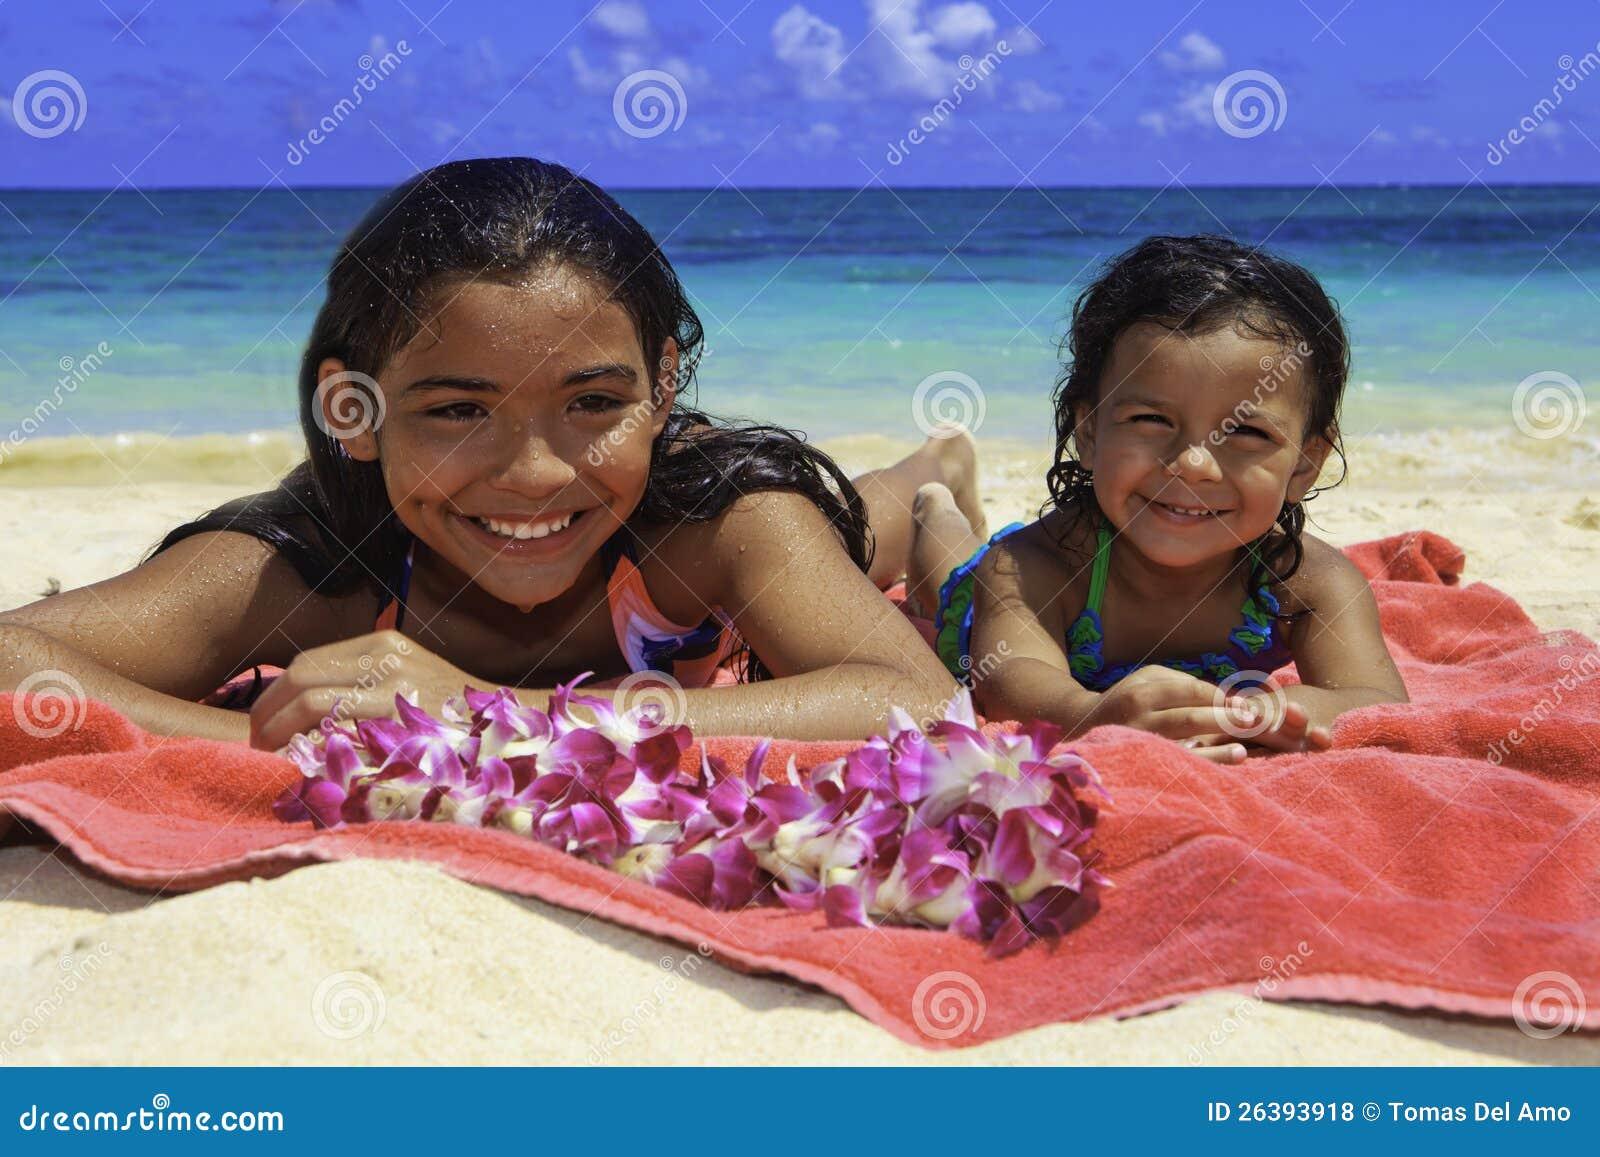 Polynesian sisters at the beach